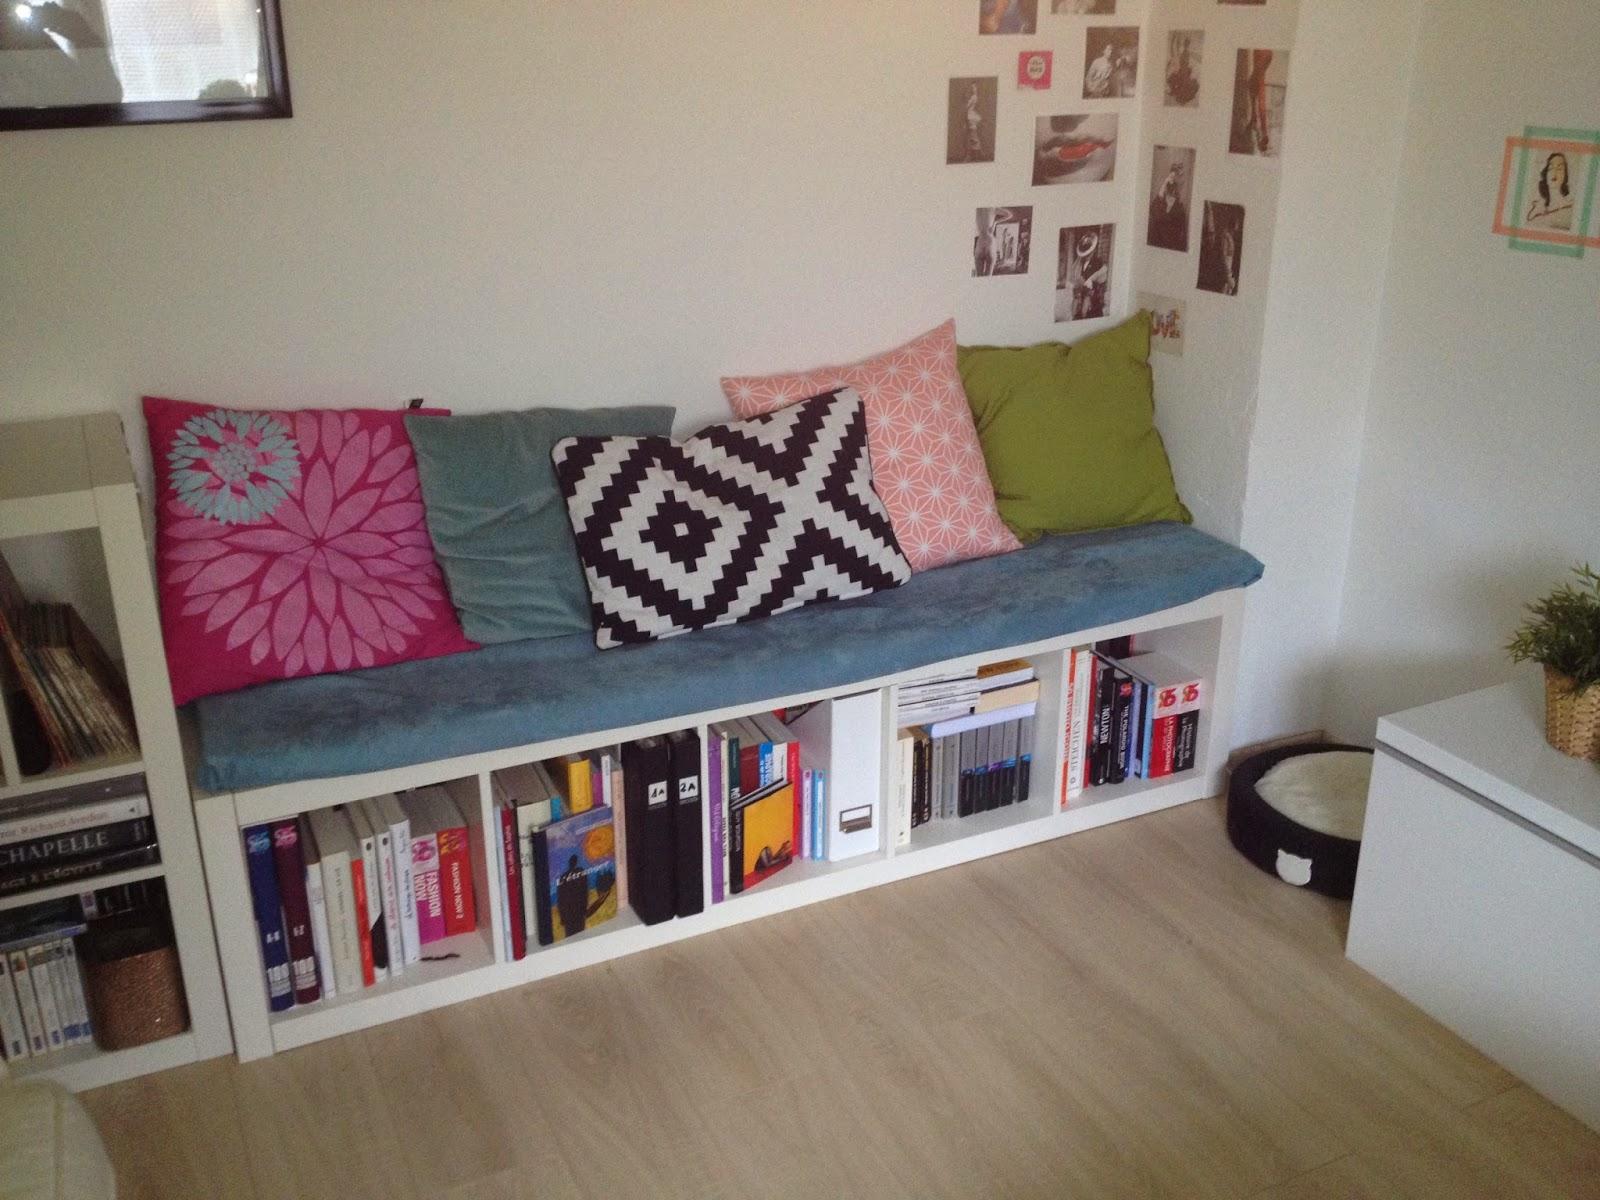 le vide id es des malignes diy d co la banquette biblioth que. Black Bedroom Furniture Sets. Home Design Ideas